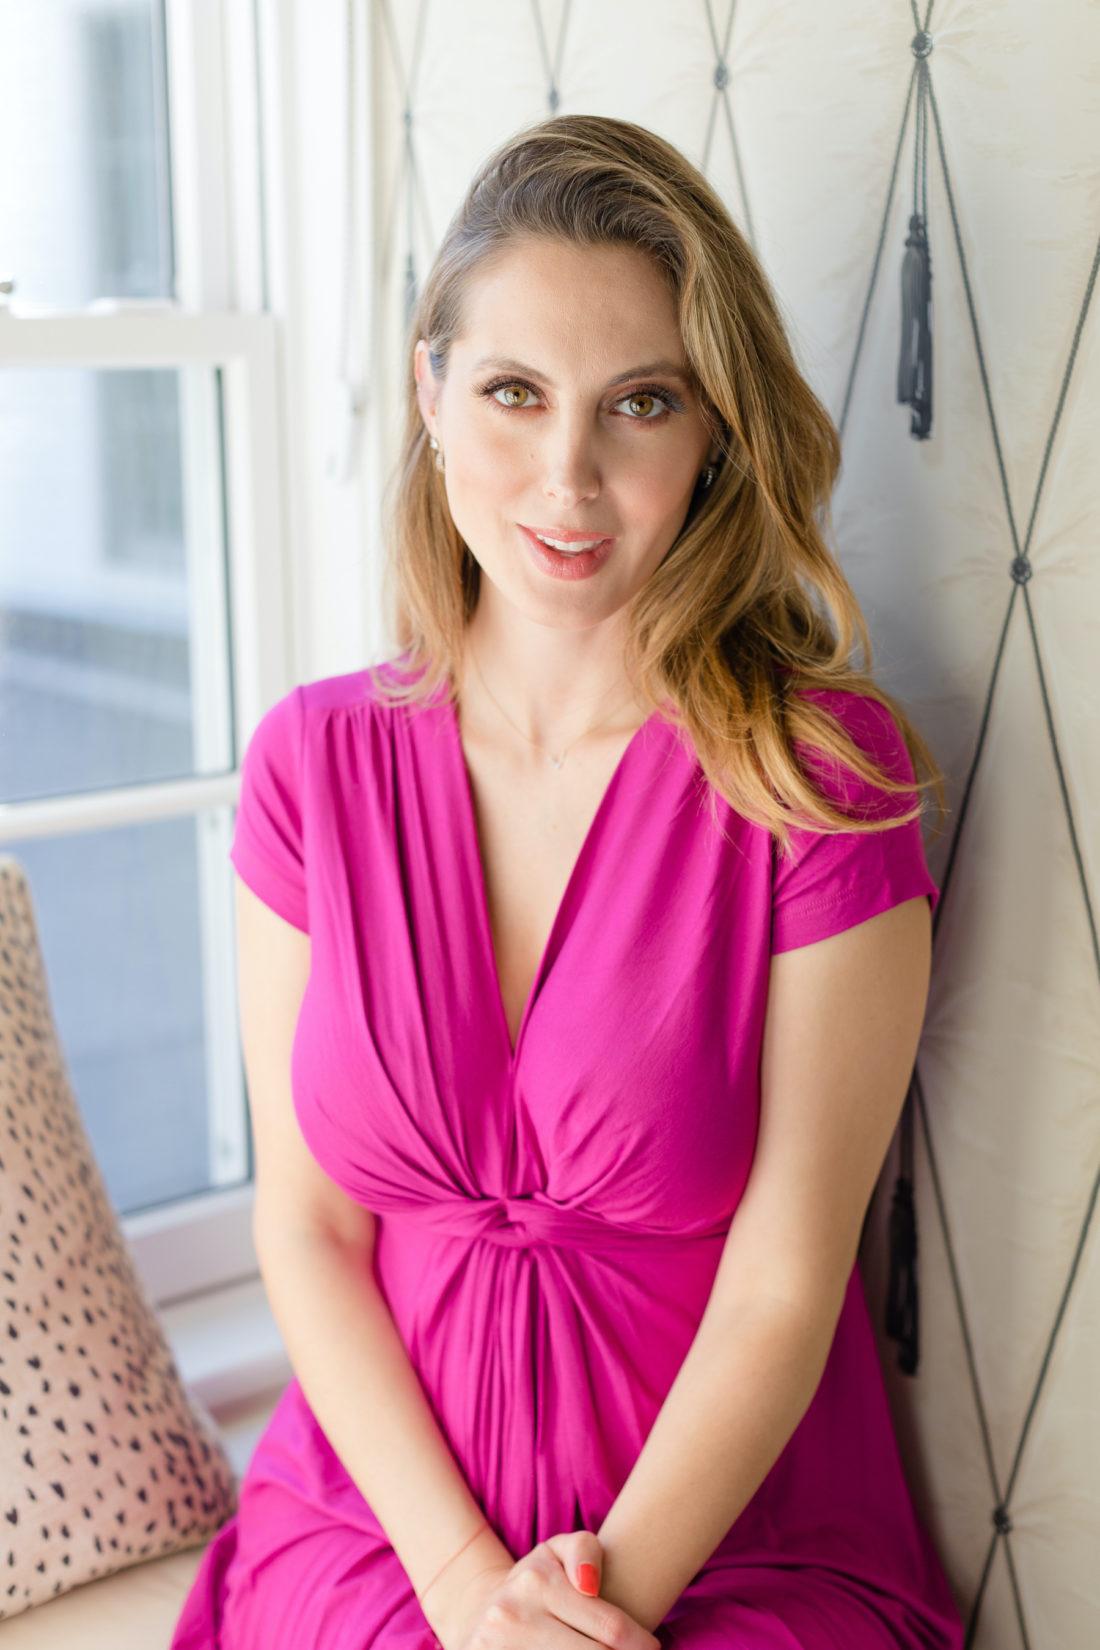 Eva Amurri Martino shares her Nighttime Eye Makeup Tutorial